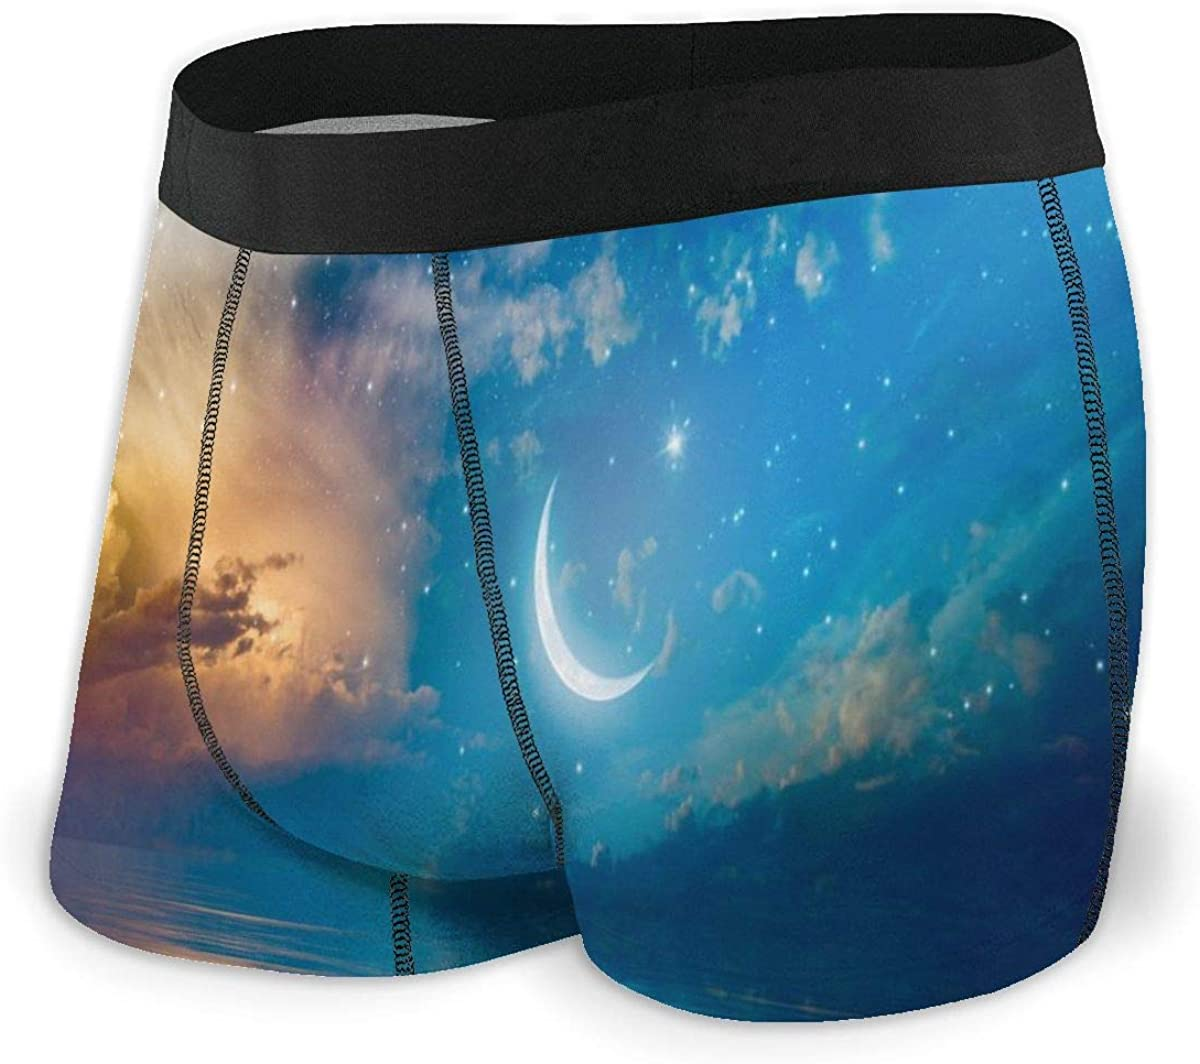 Mens Boxer Briefs Marvellous Moon in The Sky Boys Trunks Underwear Short Leg Breathable Man